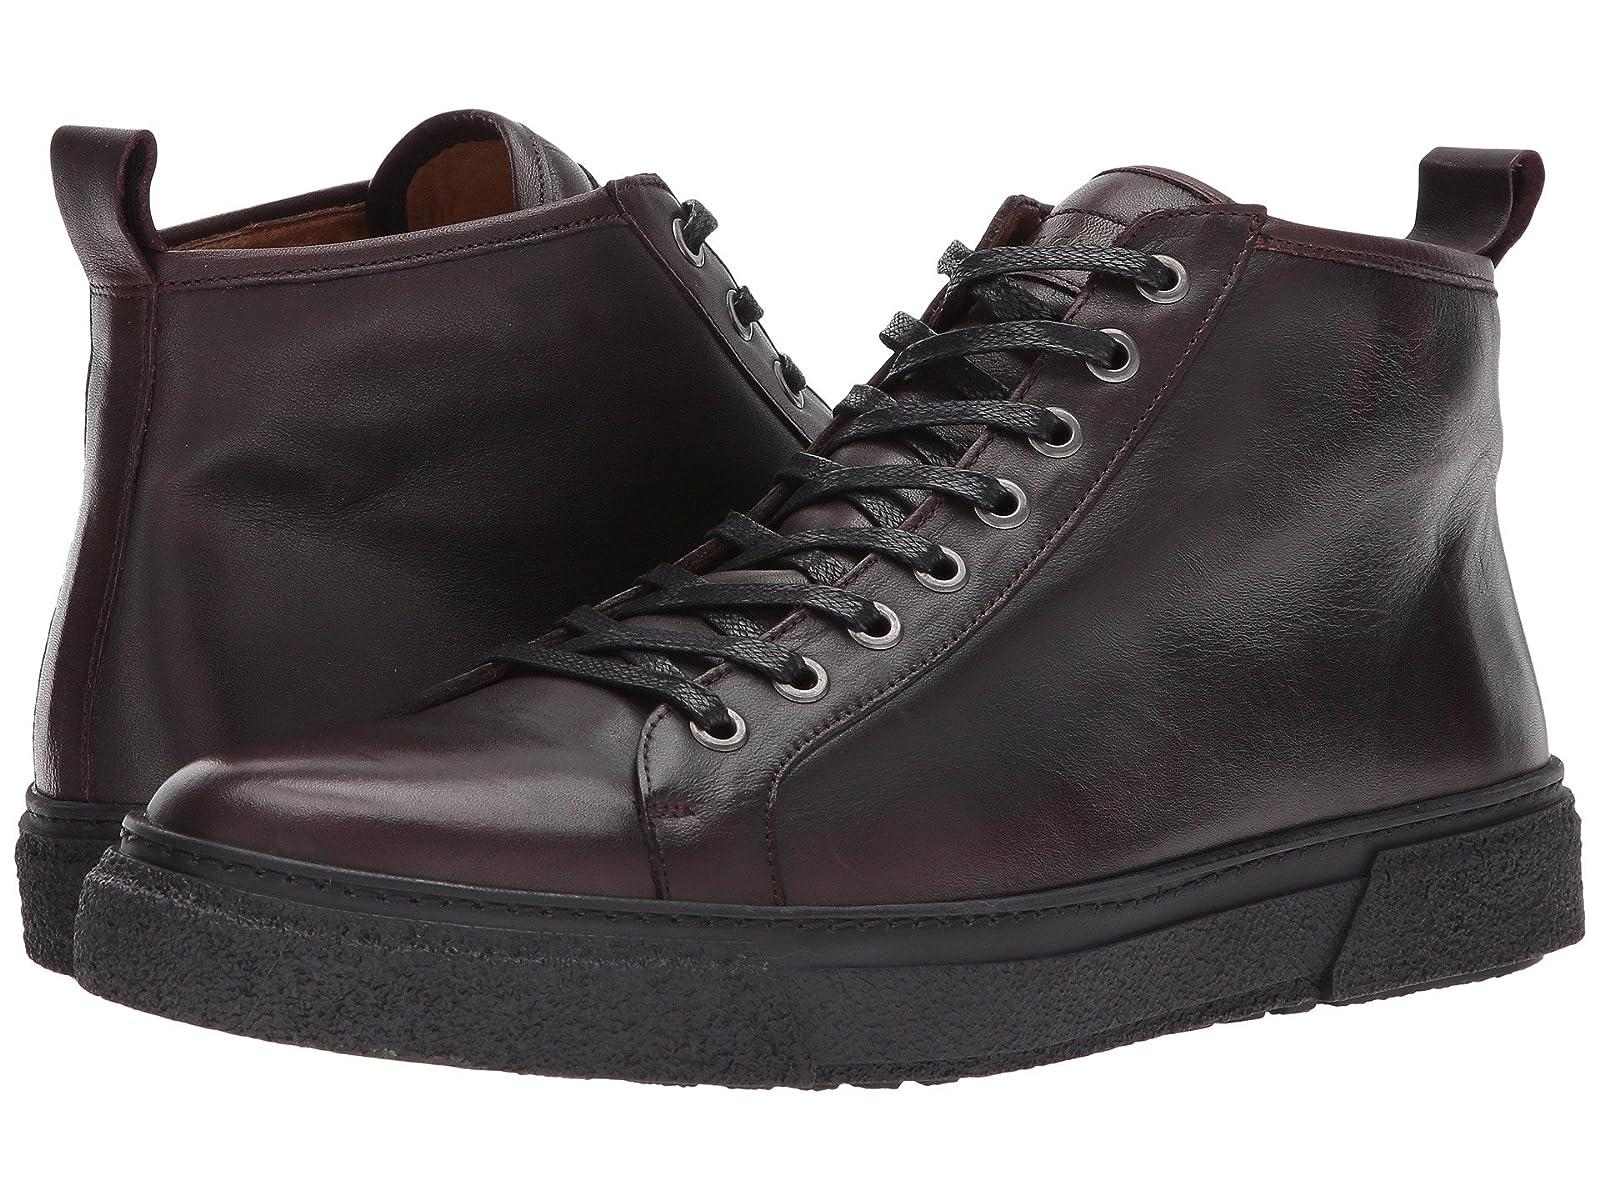 Vince Camuto WestanAtmospheric grades have affordable shoes